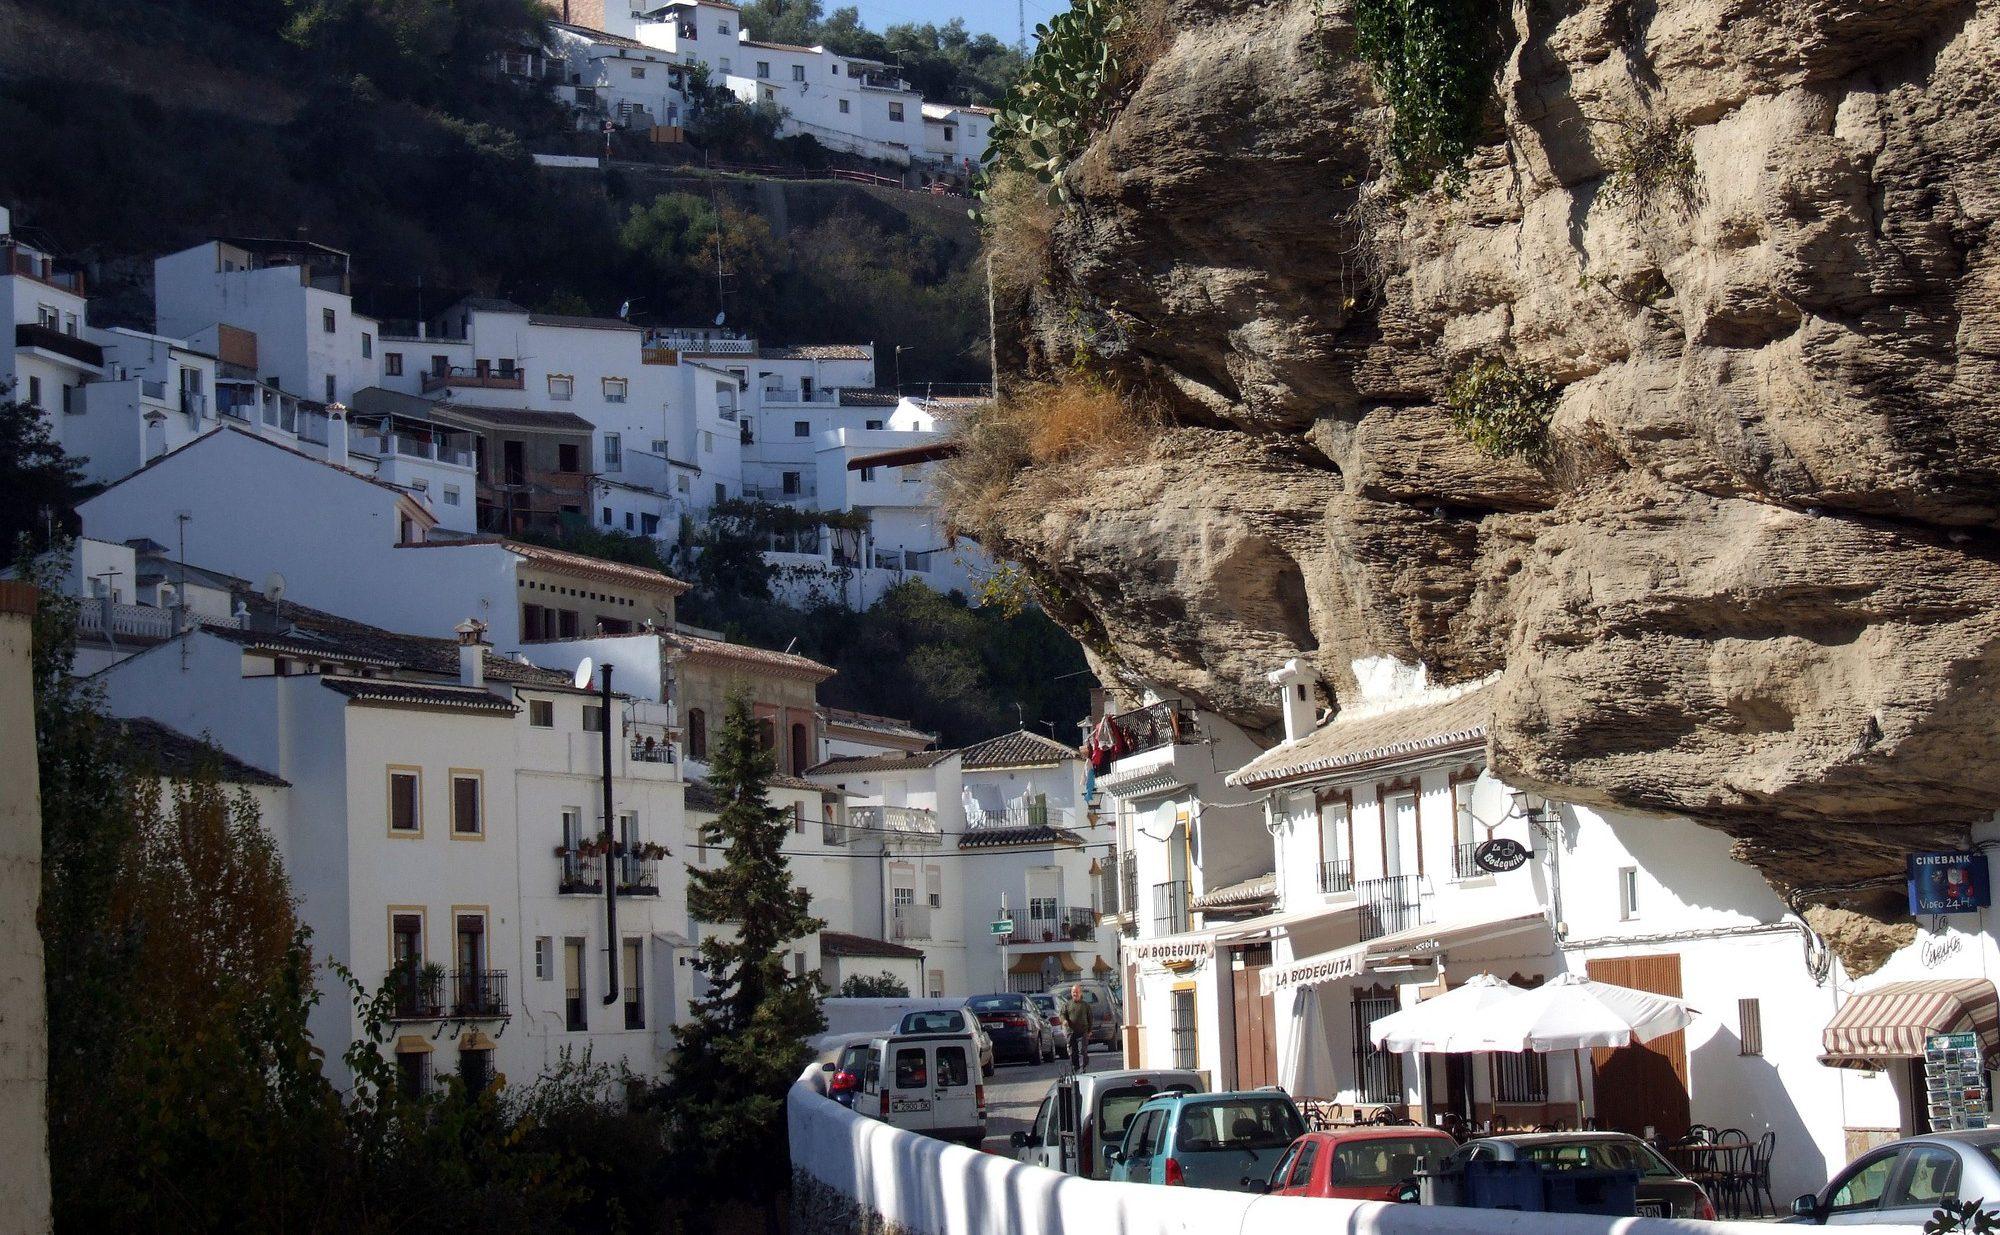 1. Setenil de las Bodegas e1498825574118 - Living Under a Rock: Setenil de las Bodegas, Cádiz